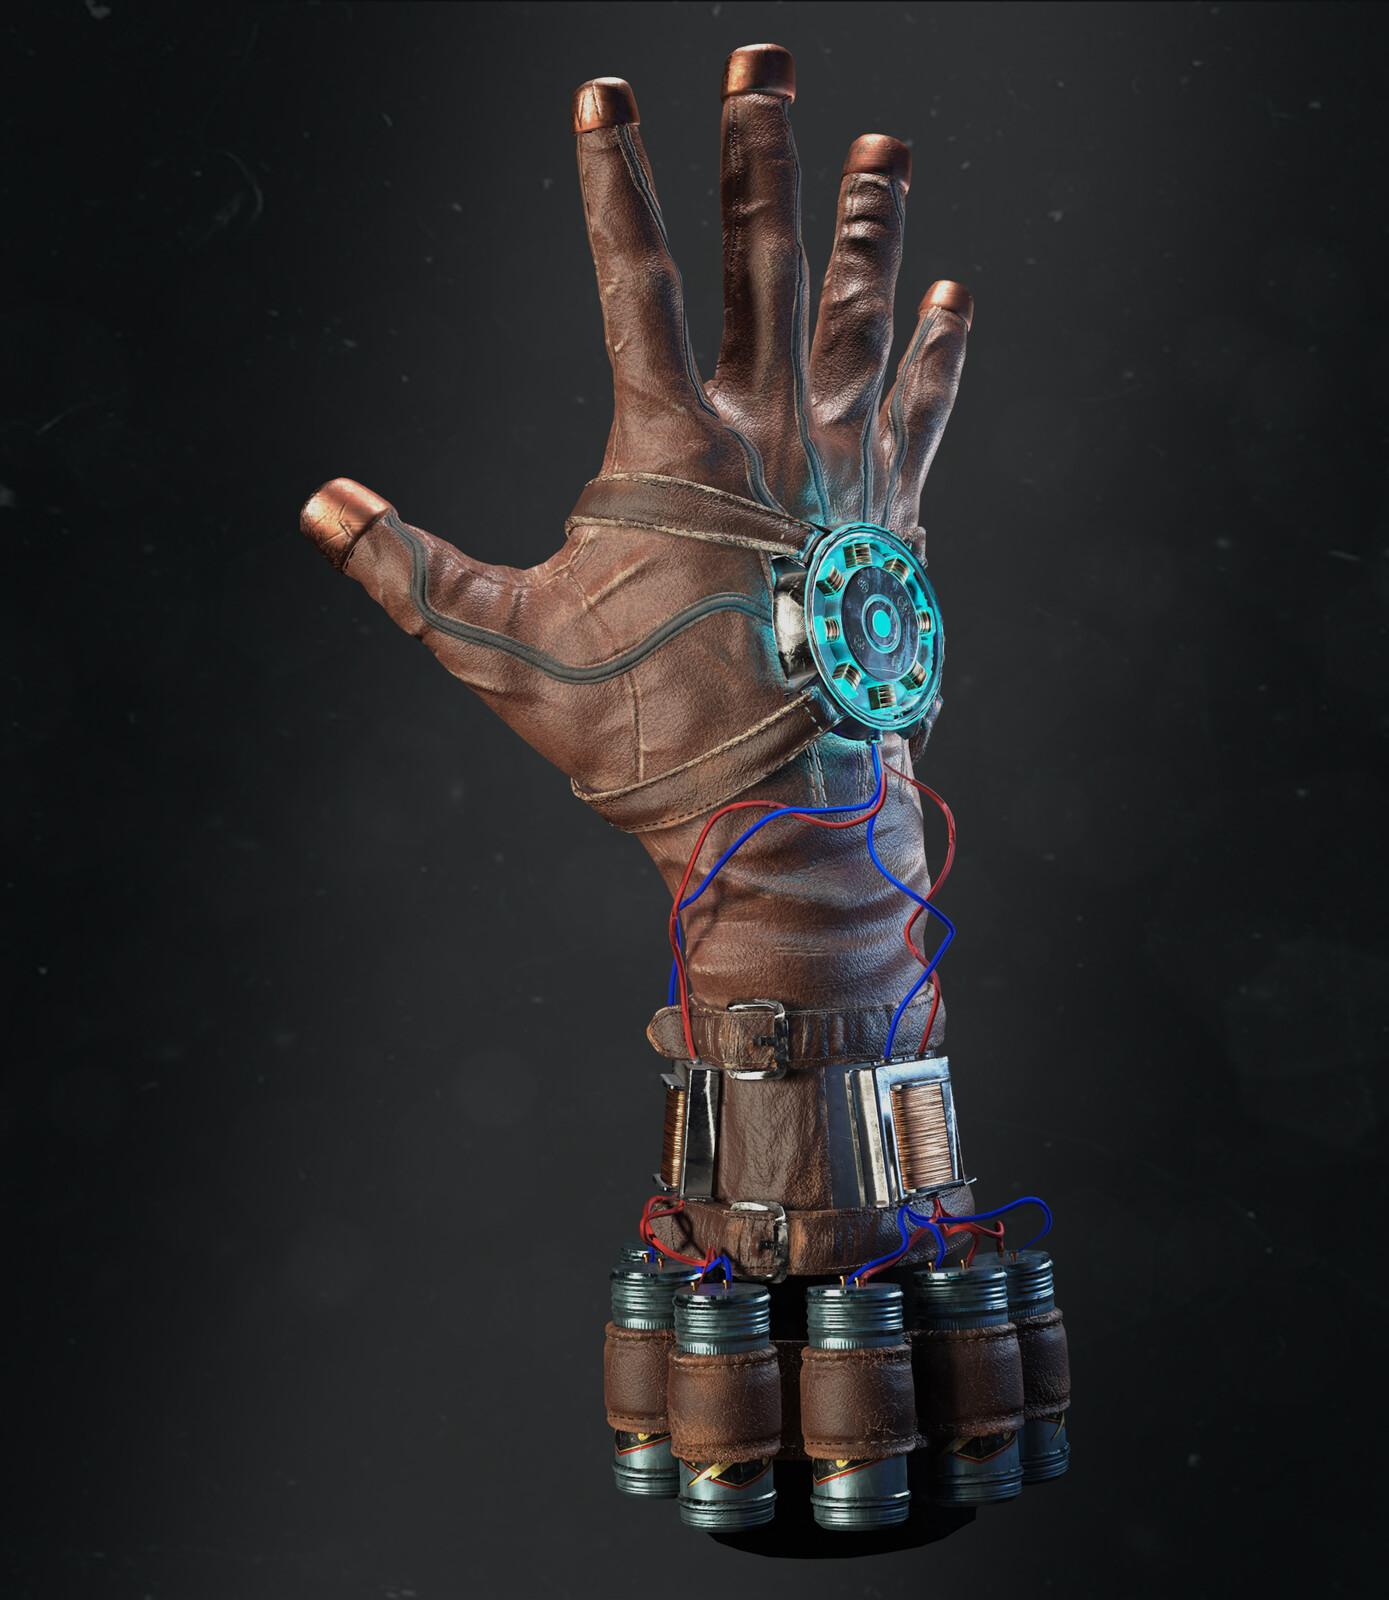 The Shock Glove